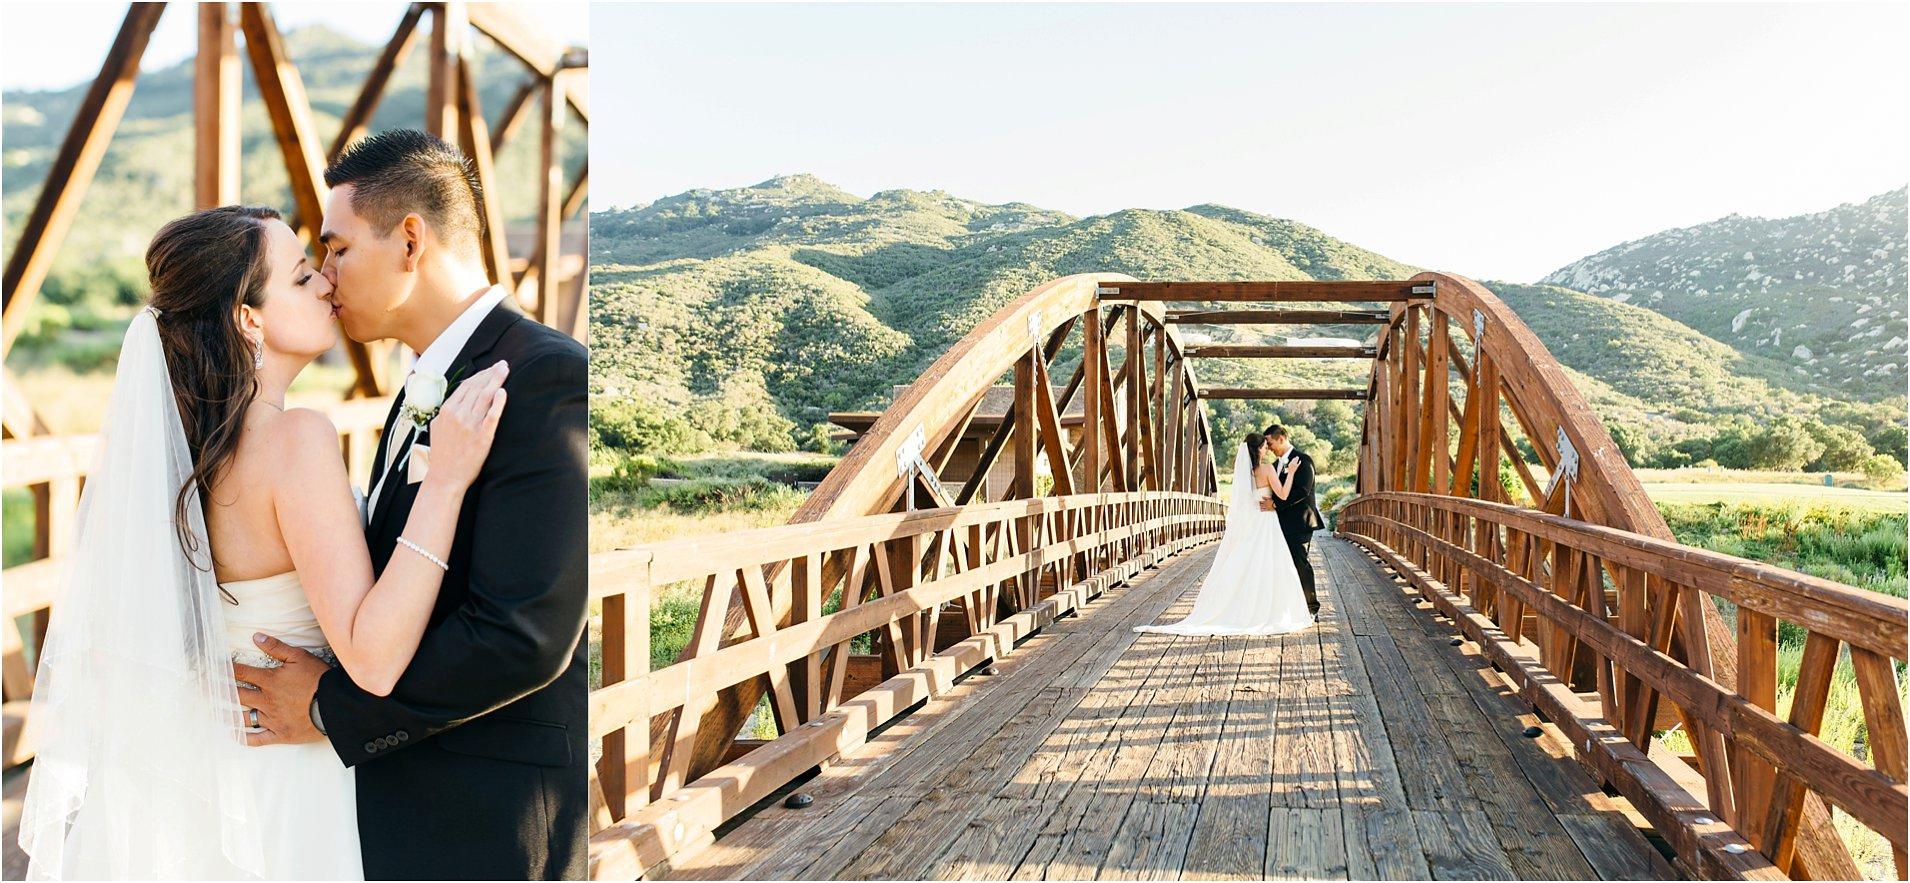 journeys end wedding photos